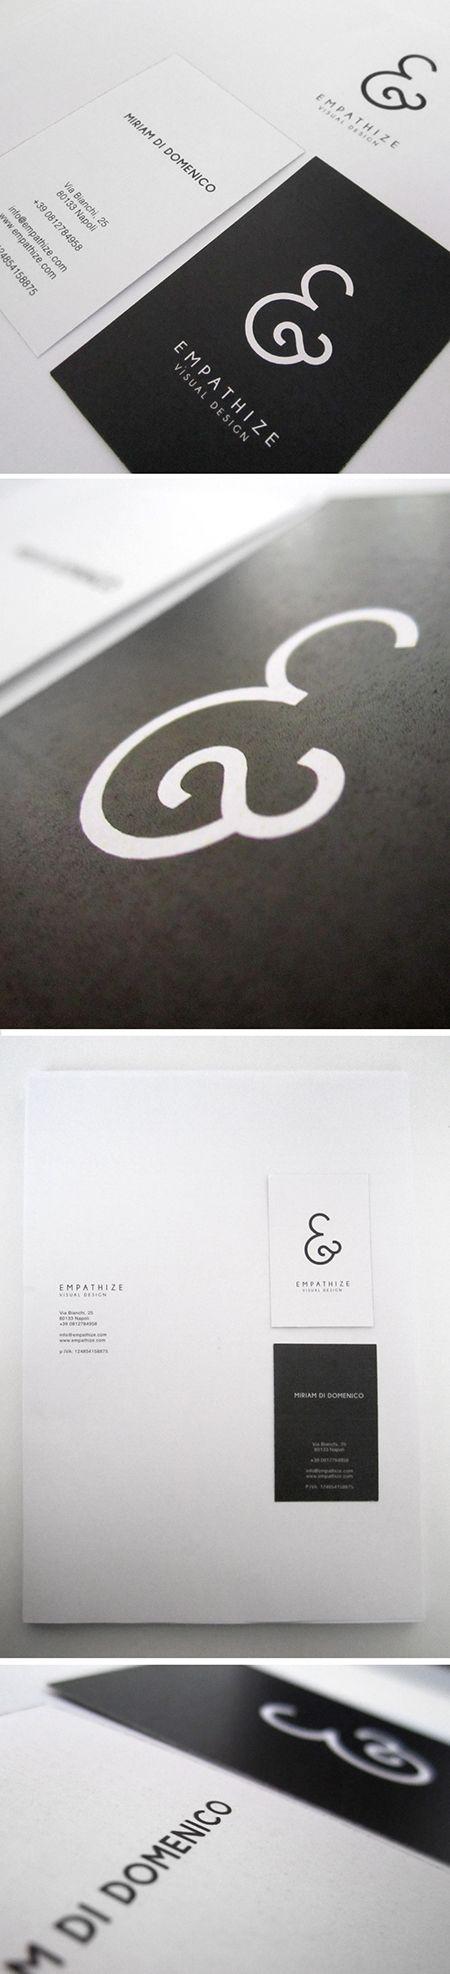 © Miriam Di Domenico | #Business #Card #letterpress #creative #paper #businesscard #corporate #design #visitenkarte #corporatedesign < repinned by www.BlickeDeeler.de